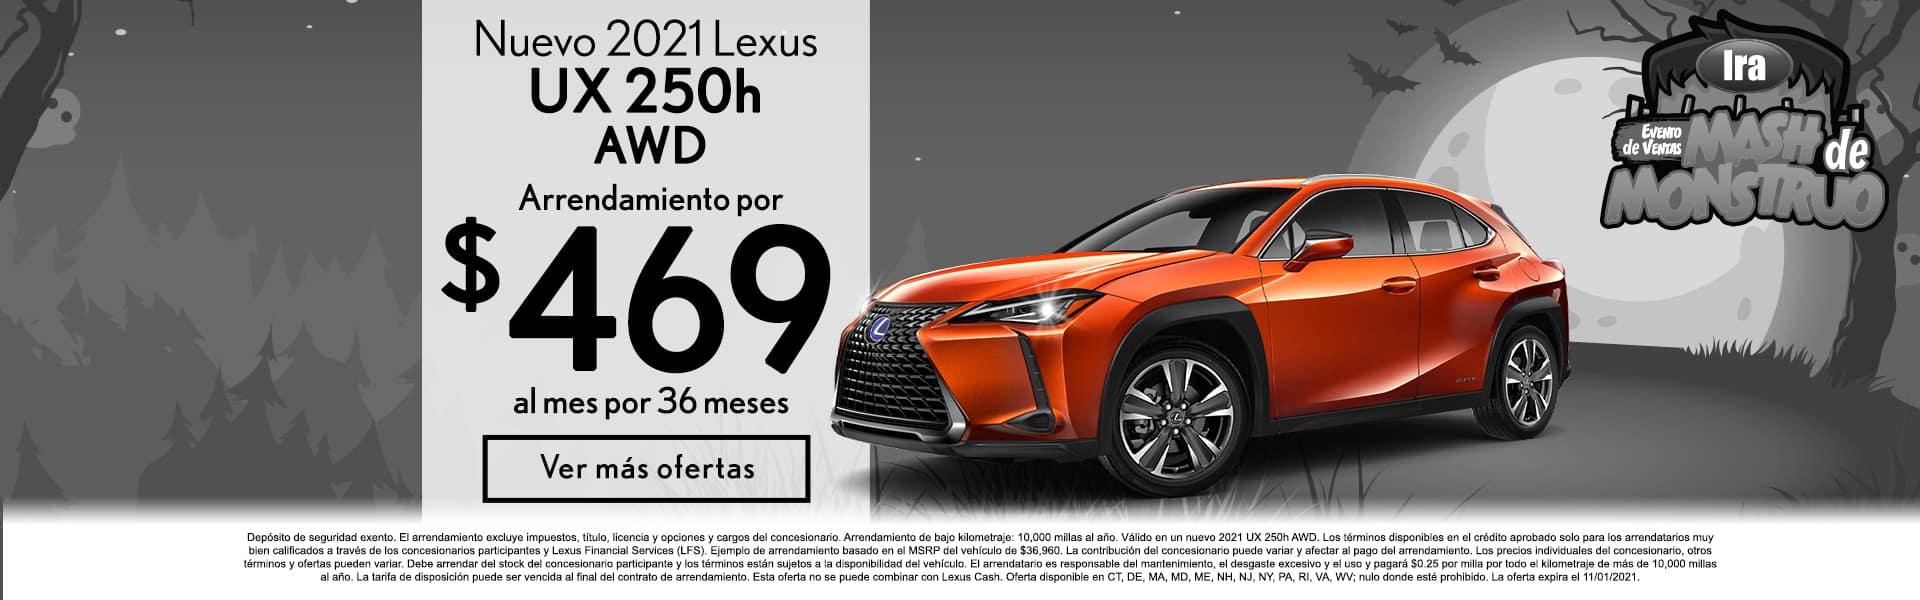 IraLexusManchester_SpanishSlide_1900x600_UX250h_10-21